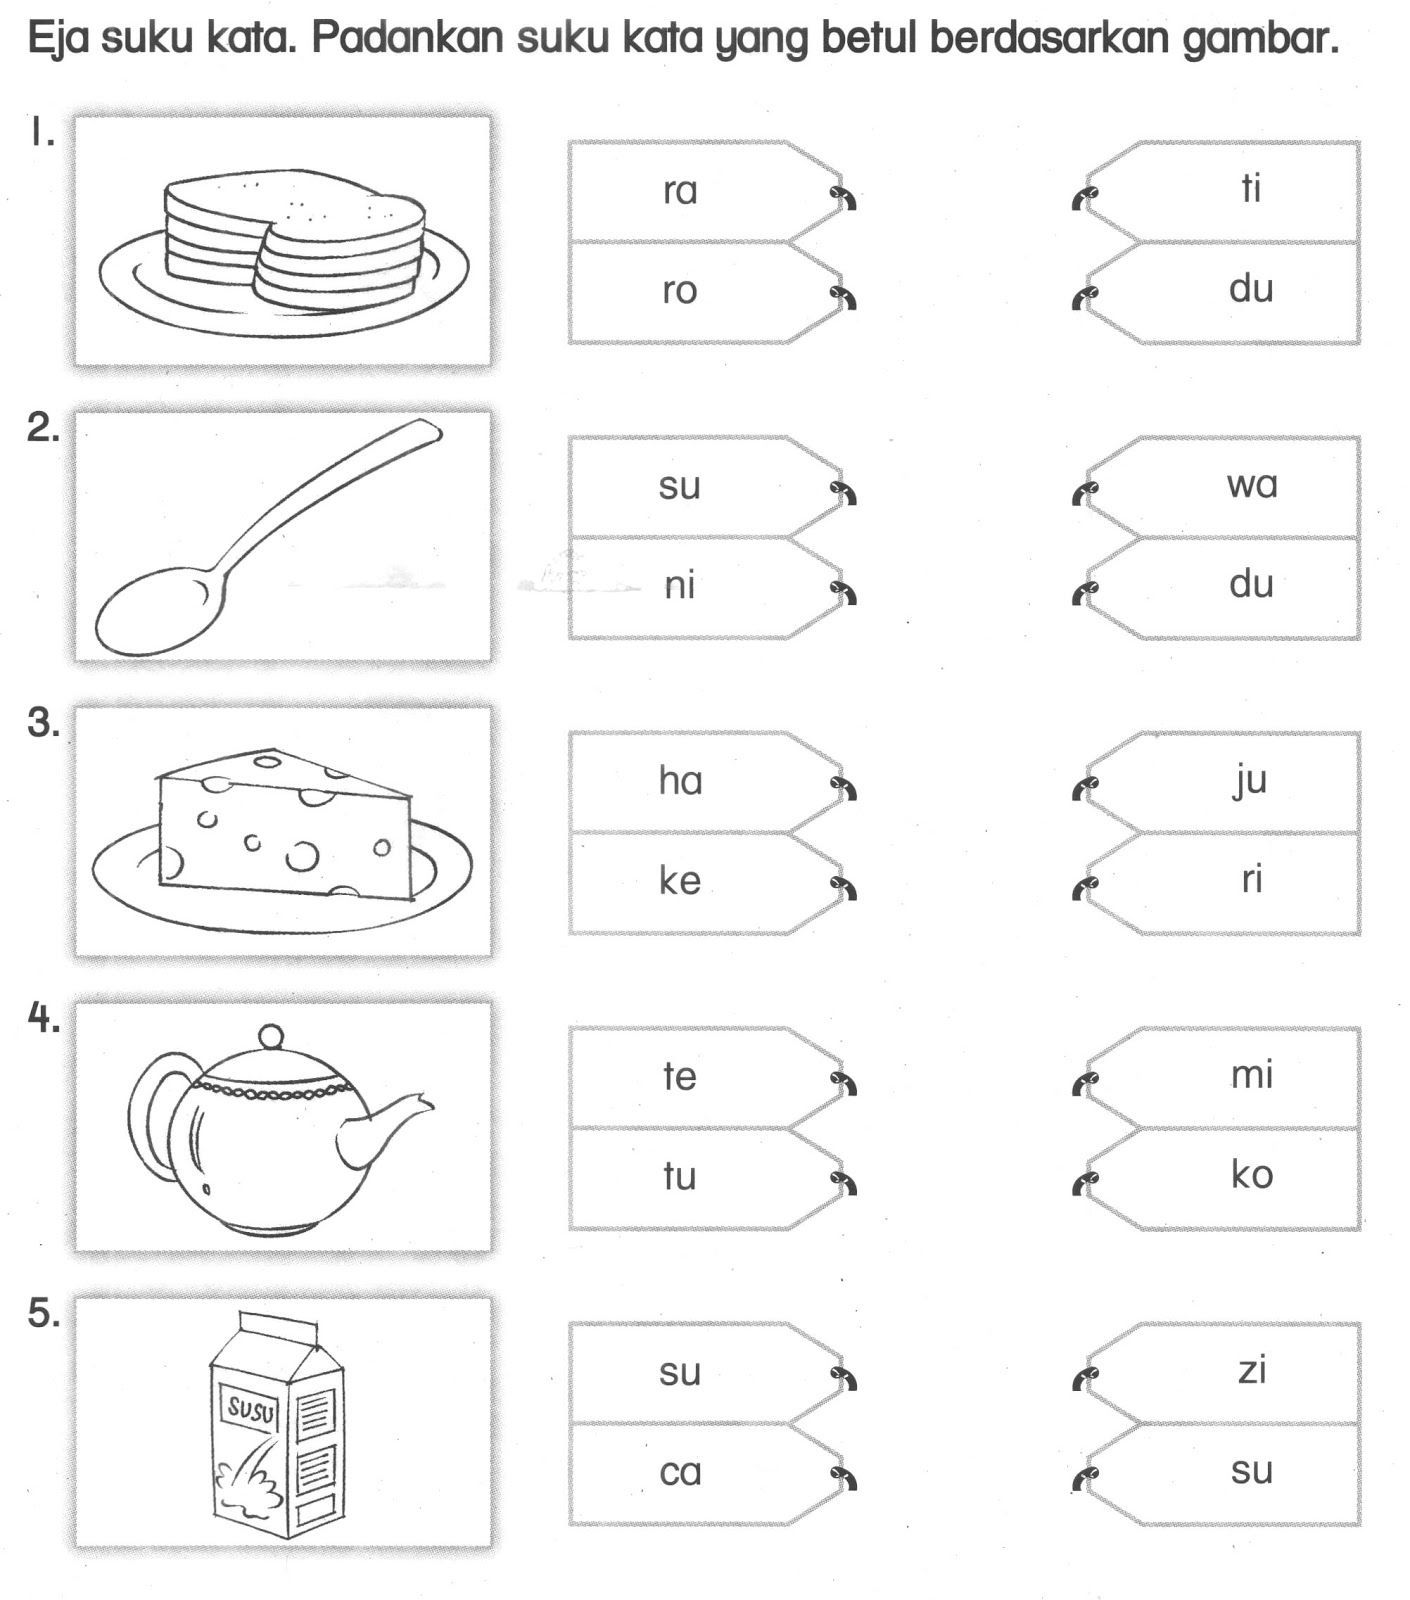 Latihan Bahasa Malaysia Tahun 1 In 2020 Preschool Worksheets Kindergarten Test Kindergarten Reading Worksheets